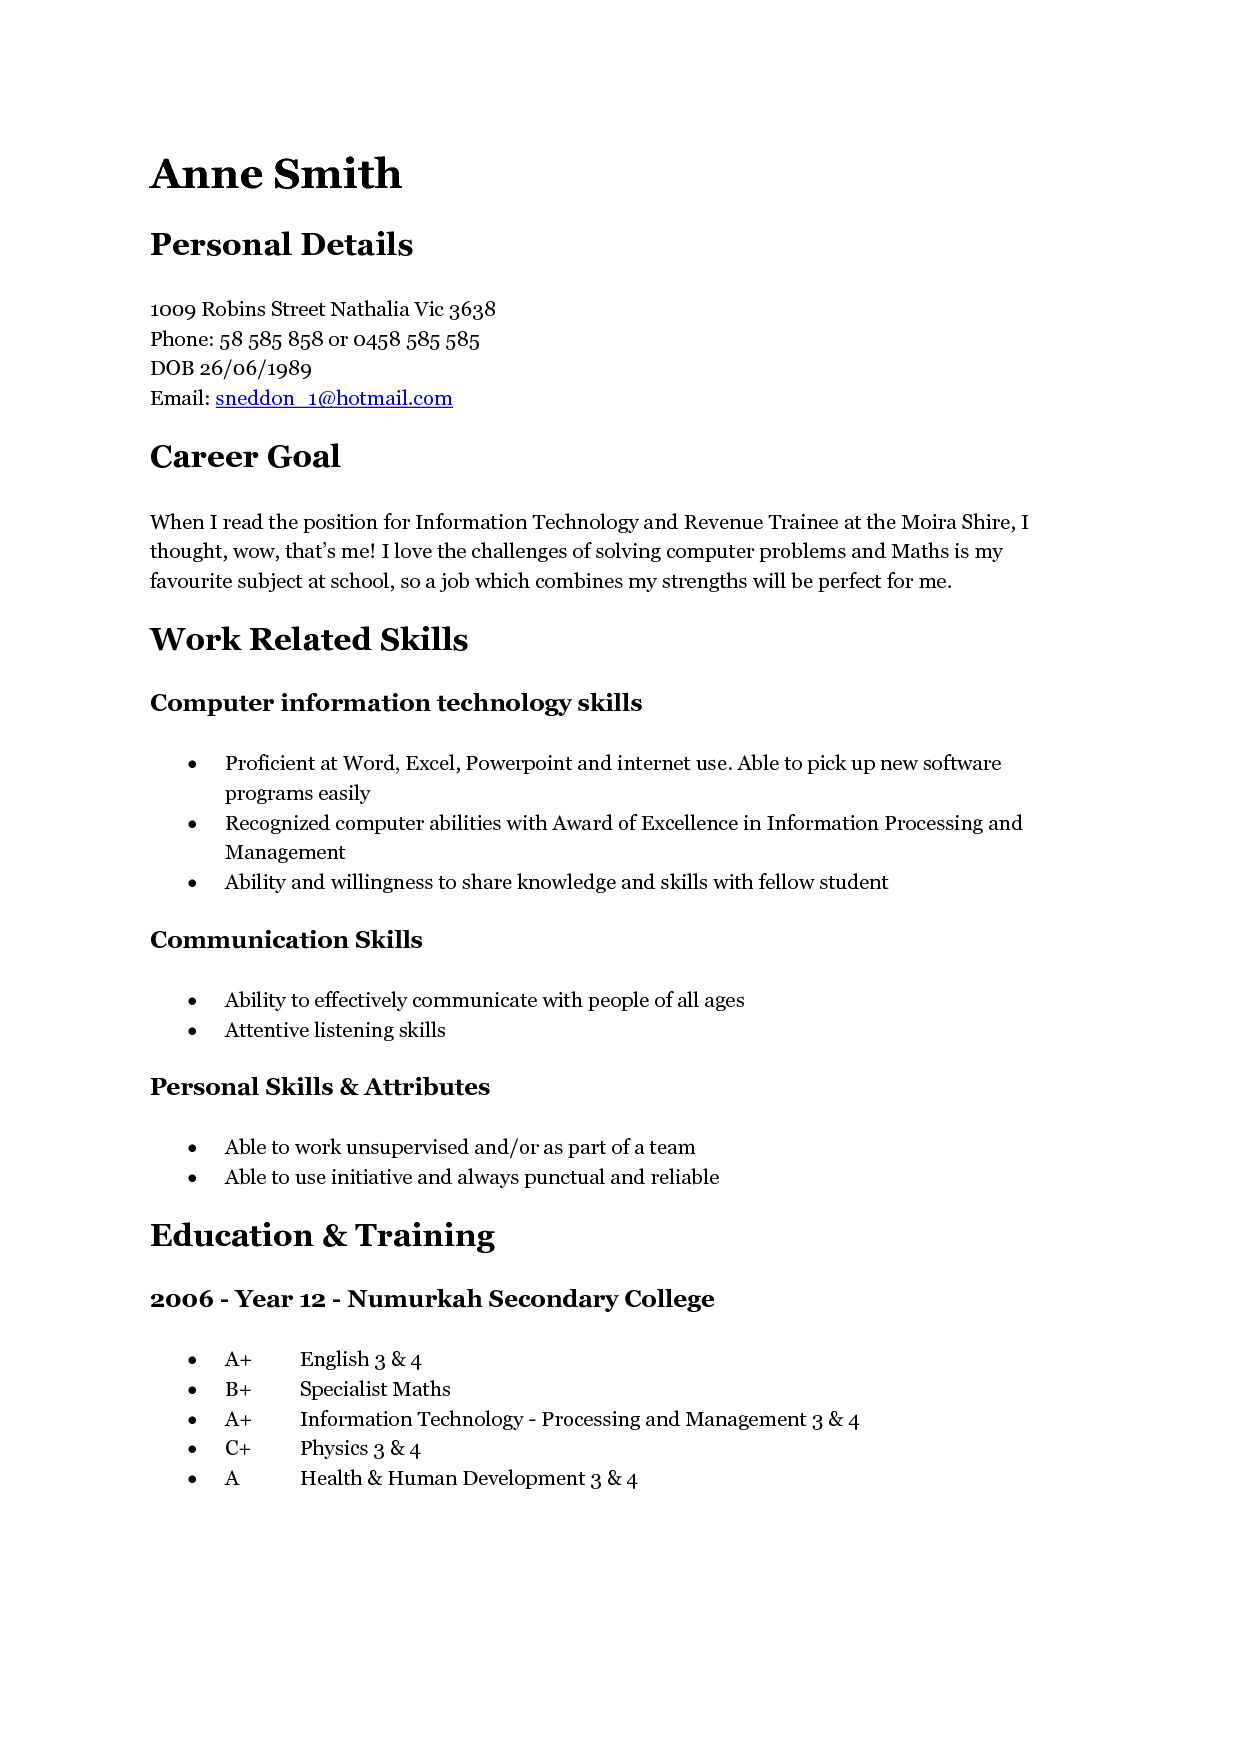 A Teenage | Certificates | Student resume, Resume examples, Job ...